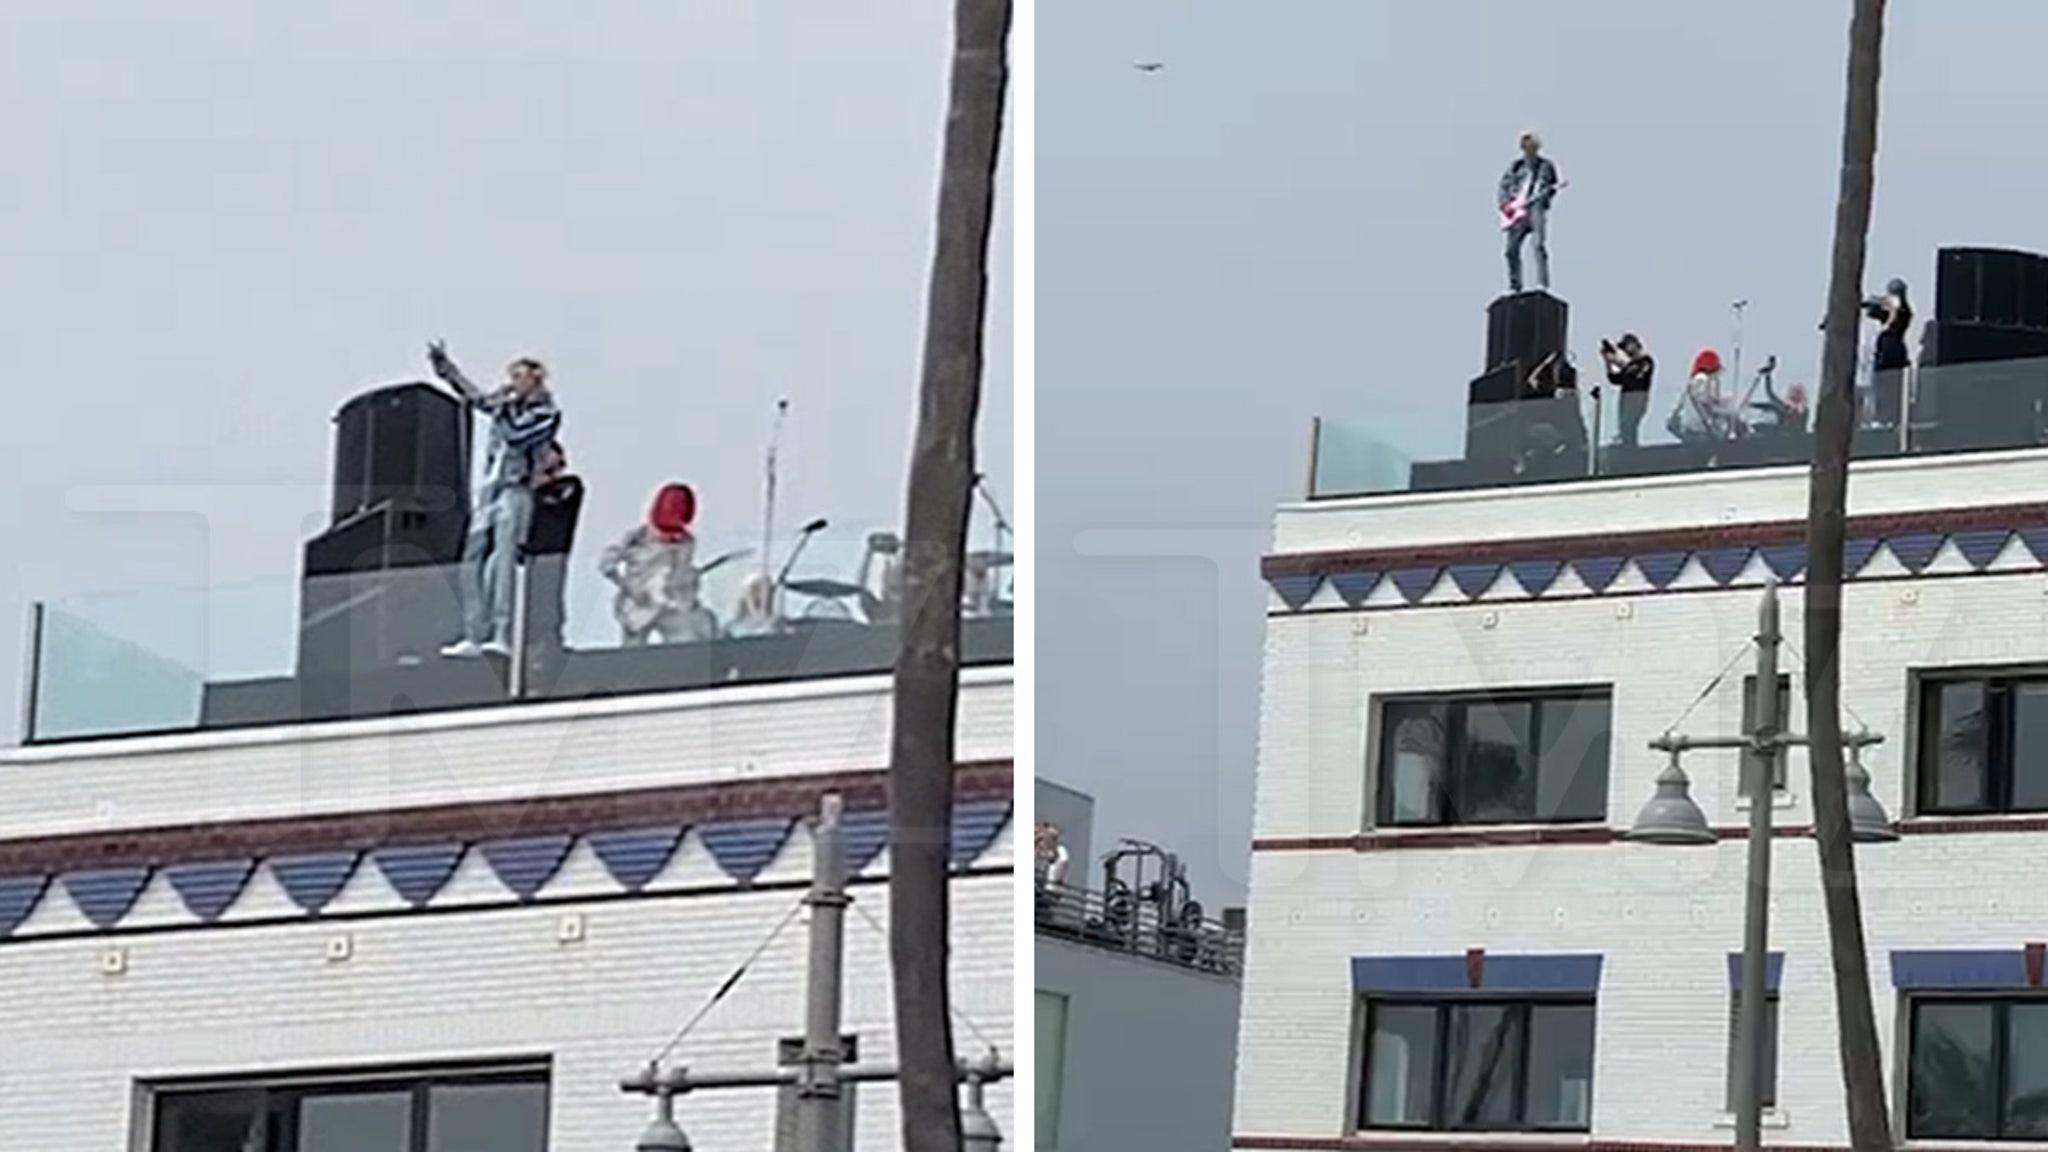 MGK, Travis Barker's Rooftop Performance Looked Kinda Dangerous - TMZ